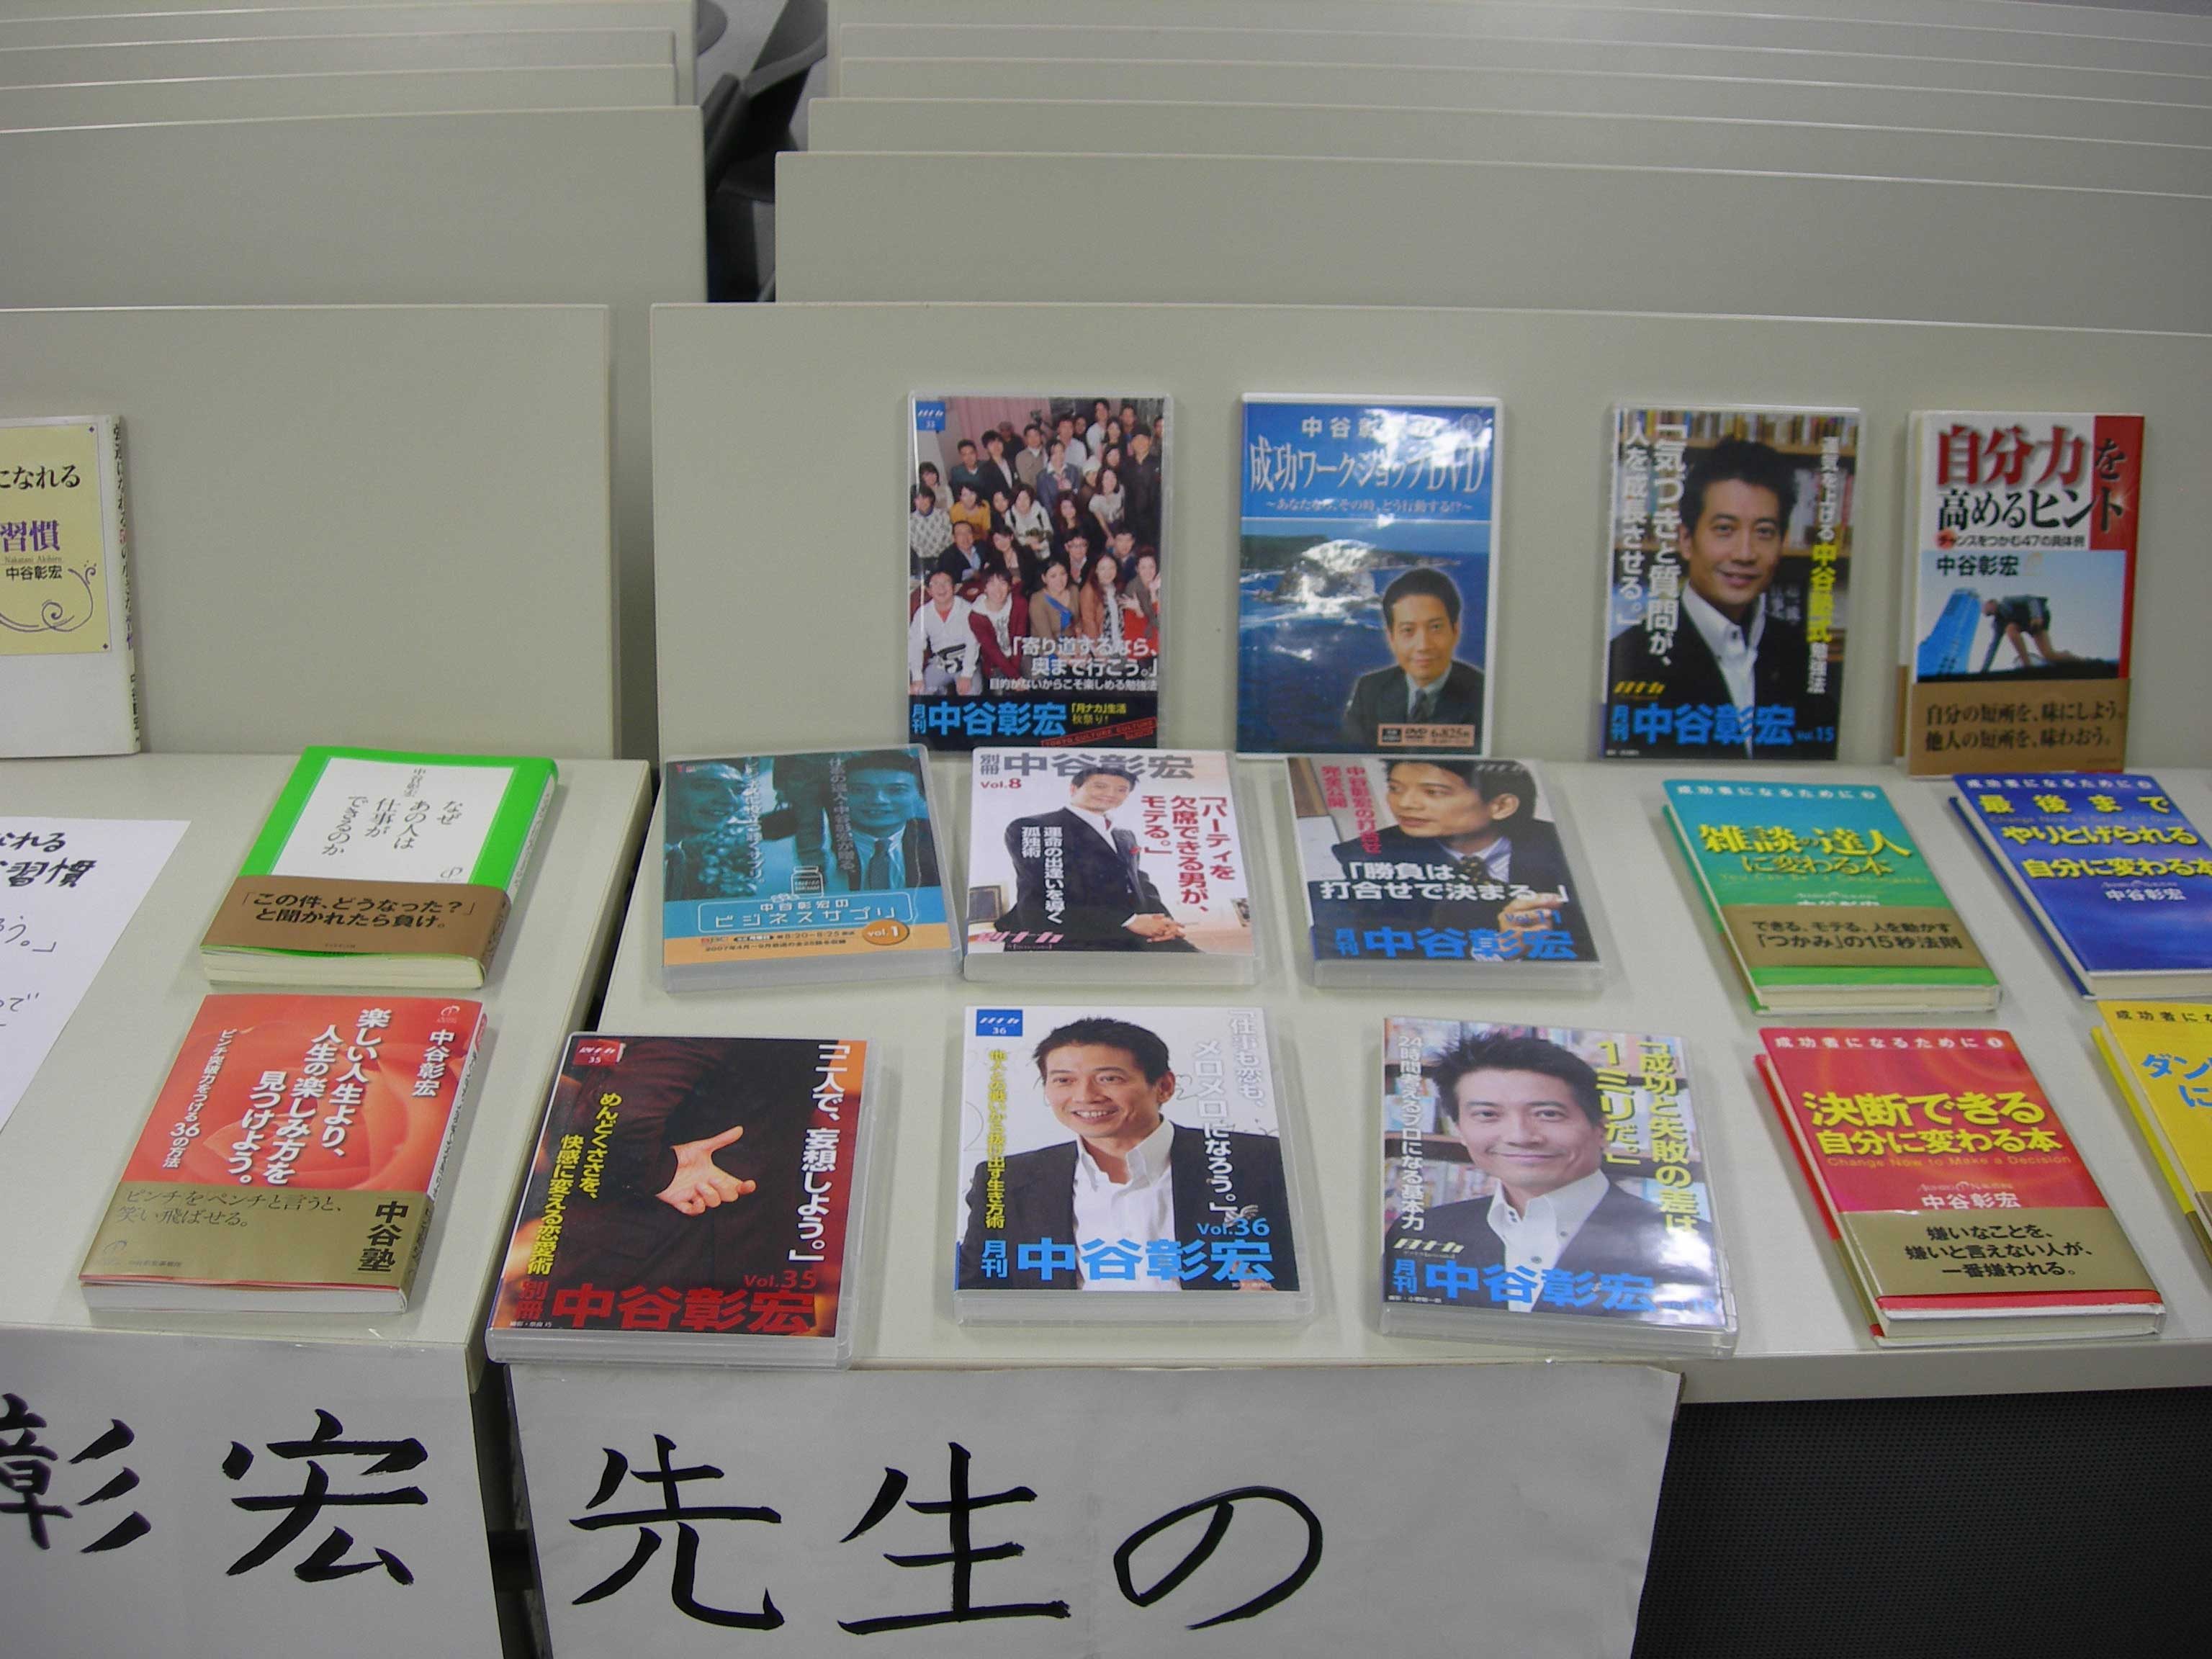 20100411_紹介コーナー_1.jpg